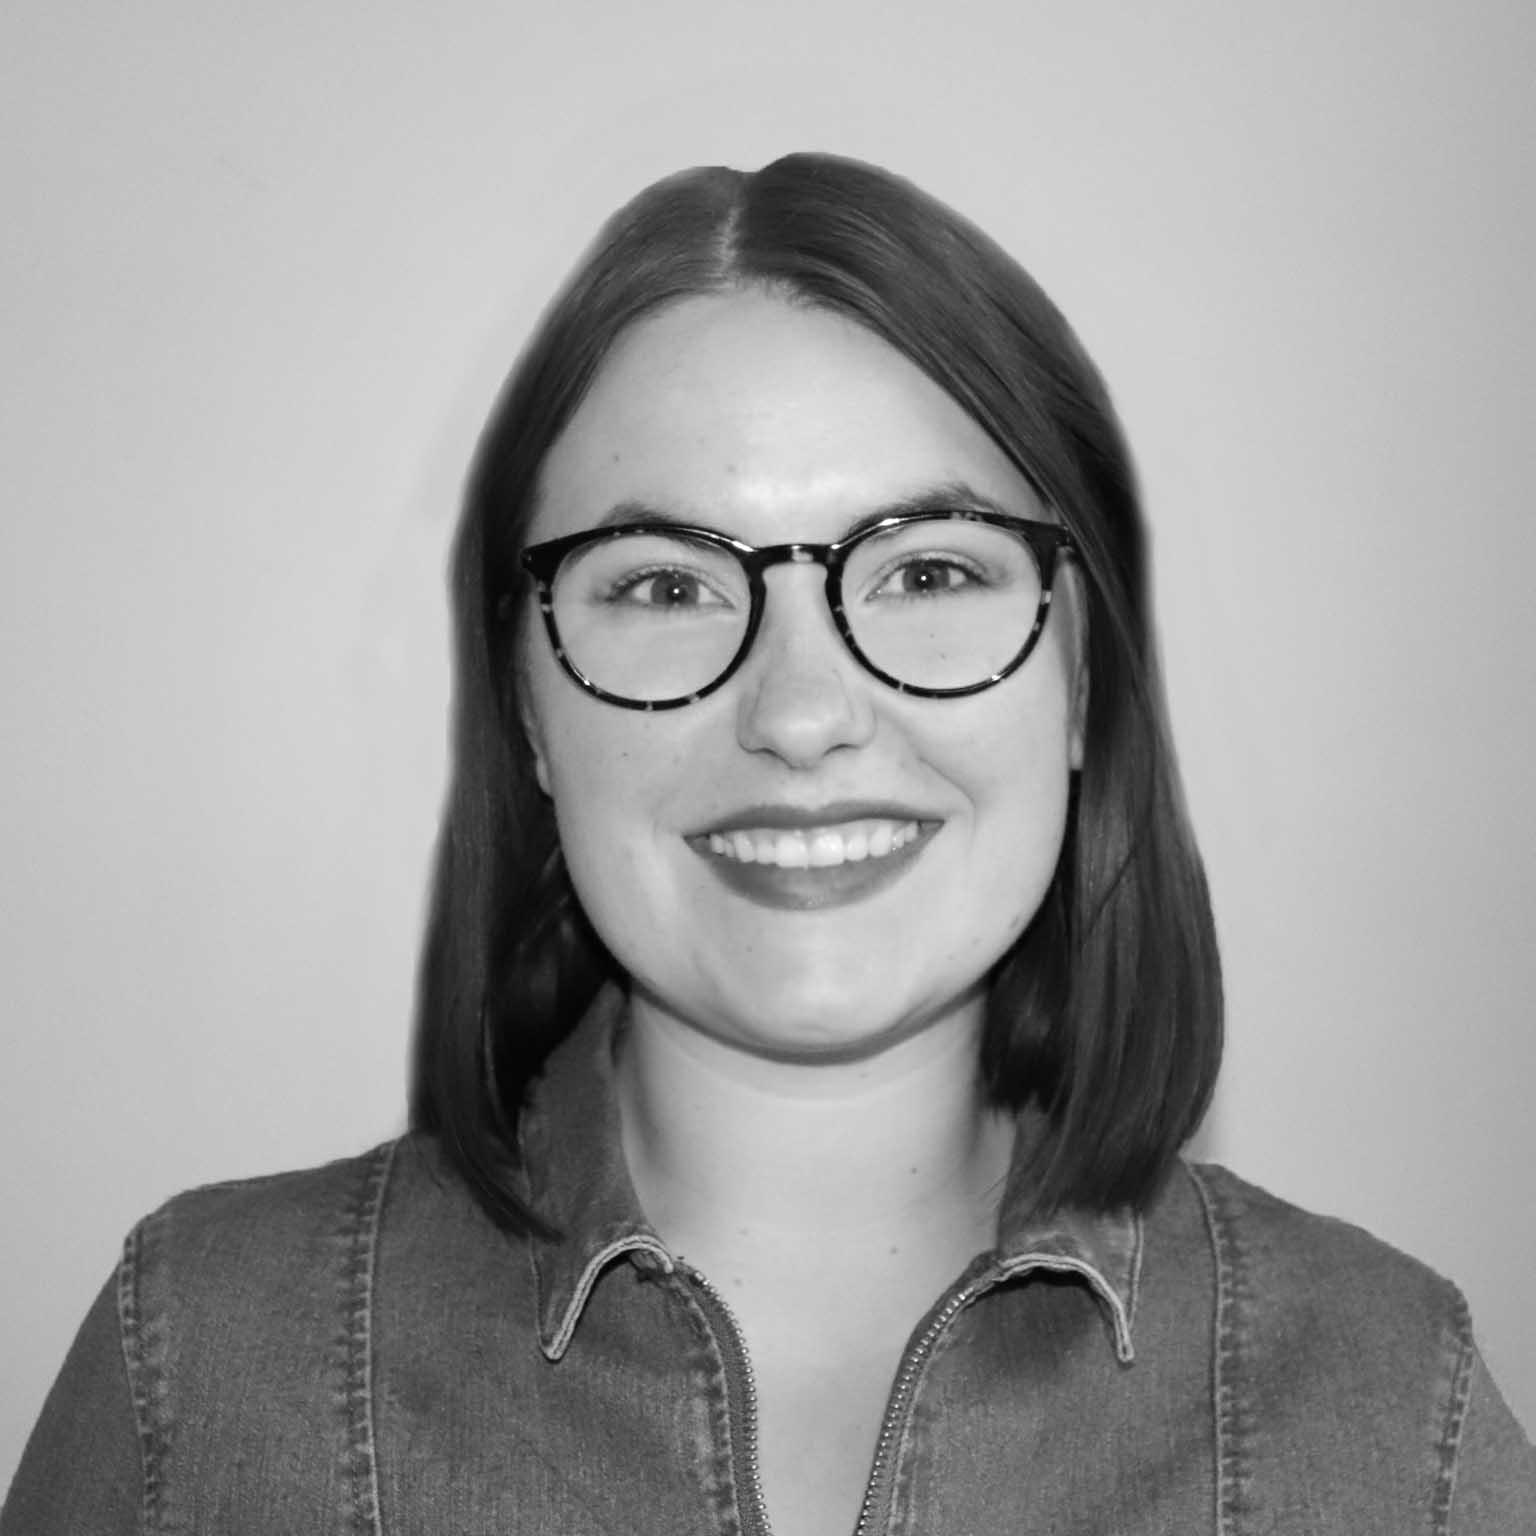 Sadie Evans - Community Manager